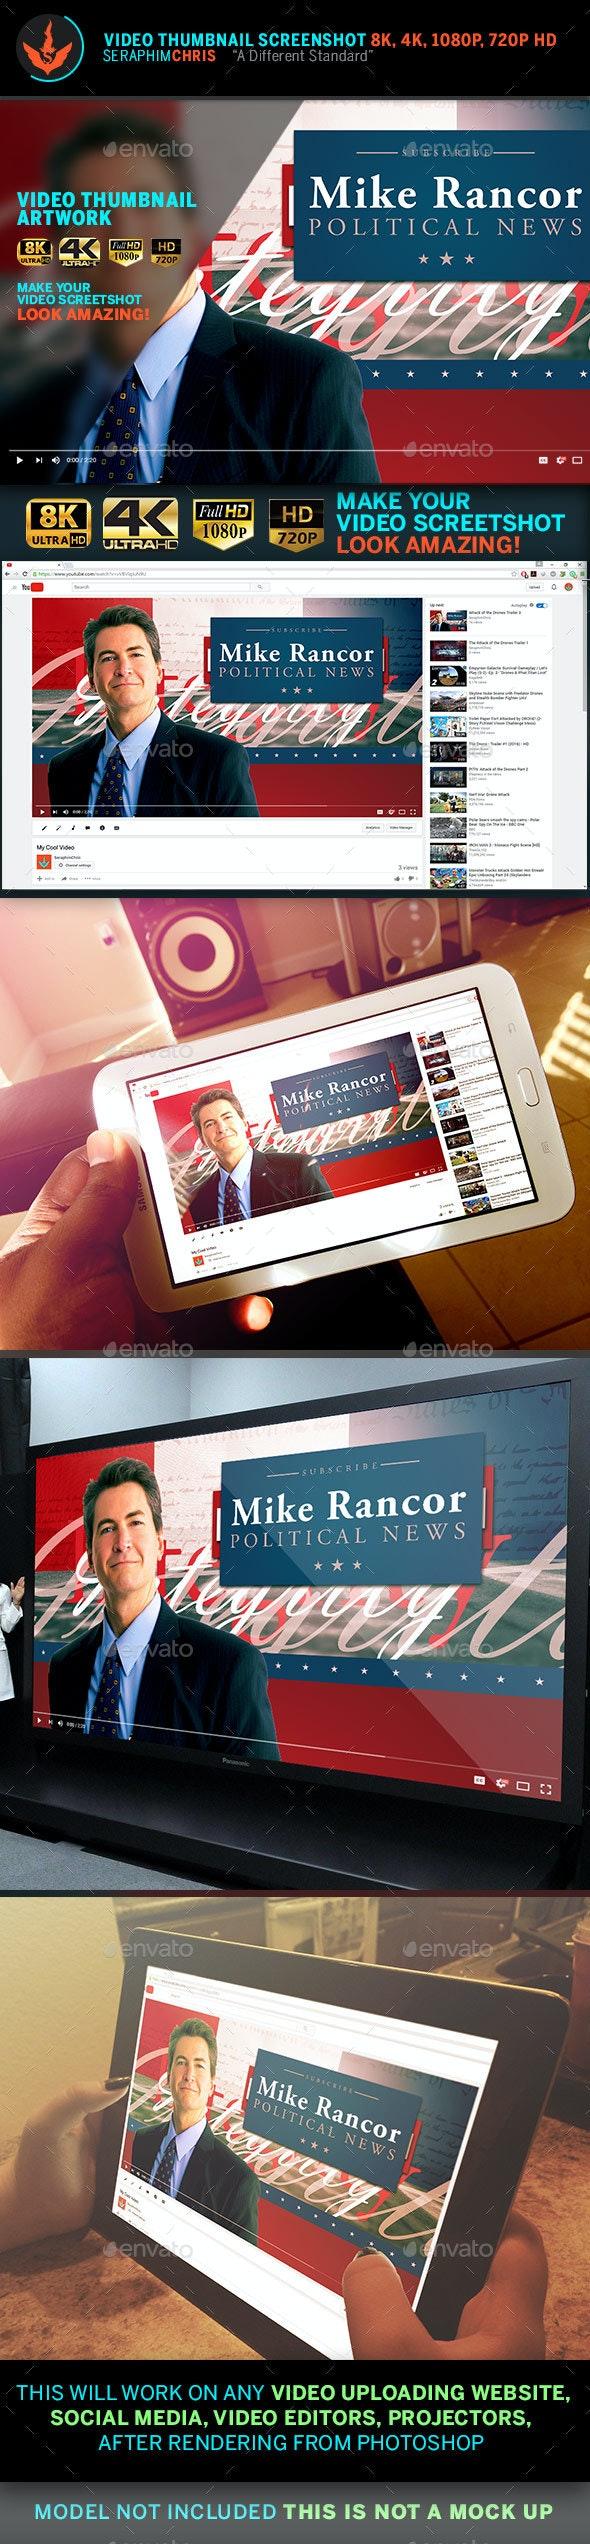 Political YouTube Video Thumbnail Screenshot Template 7 - YouTube Social Media